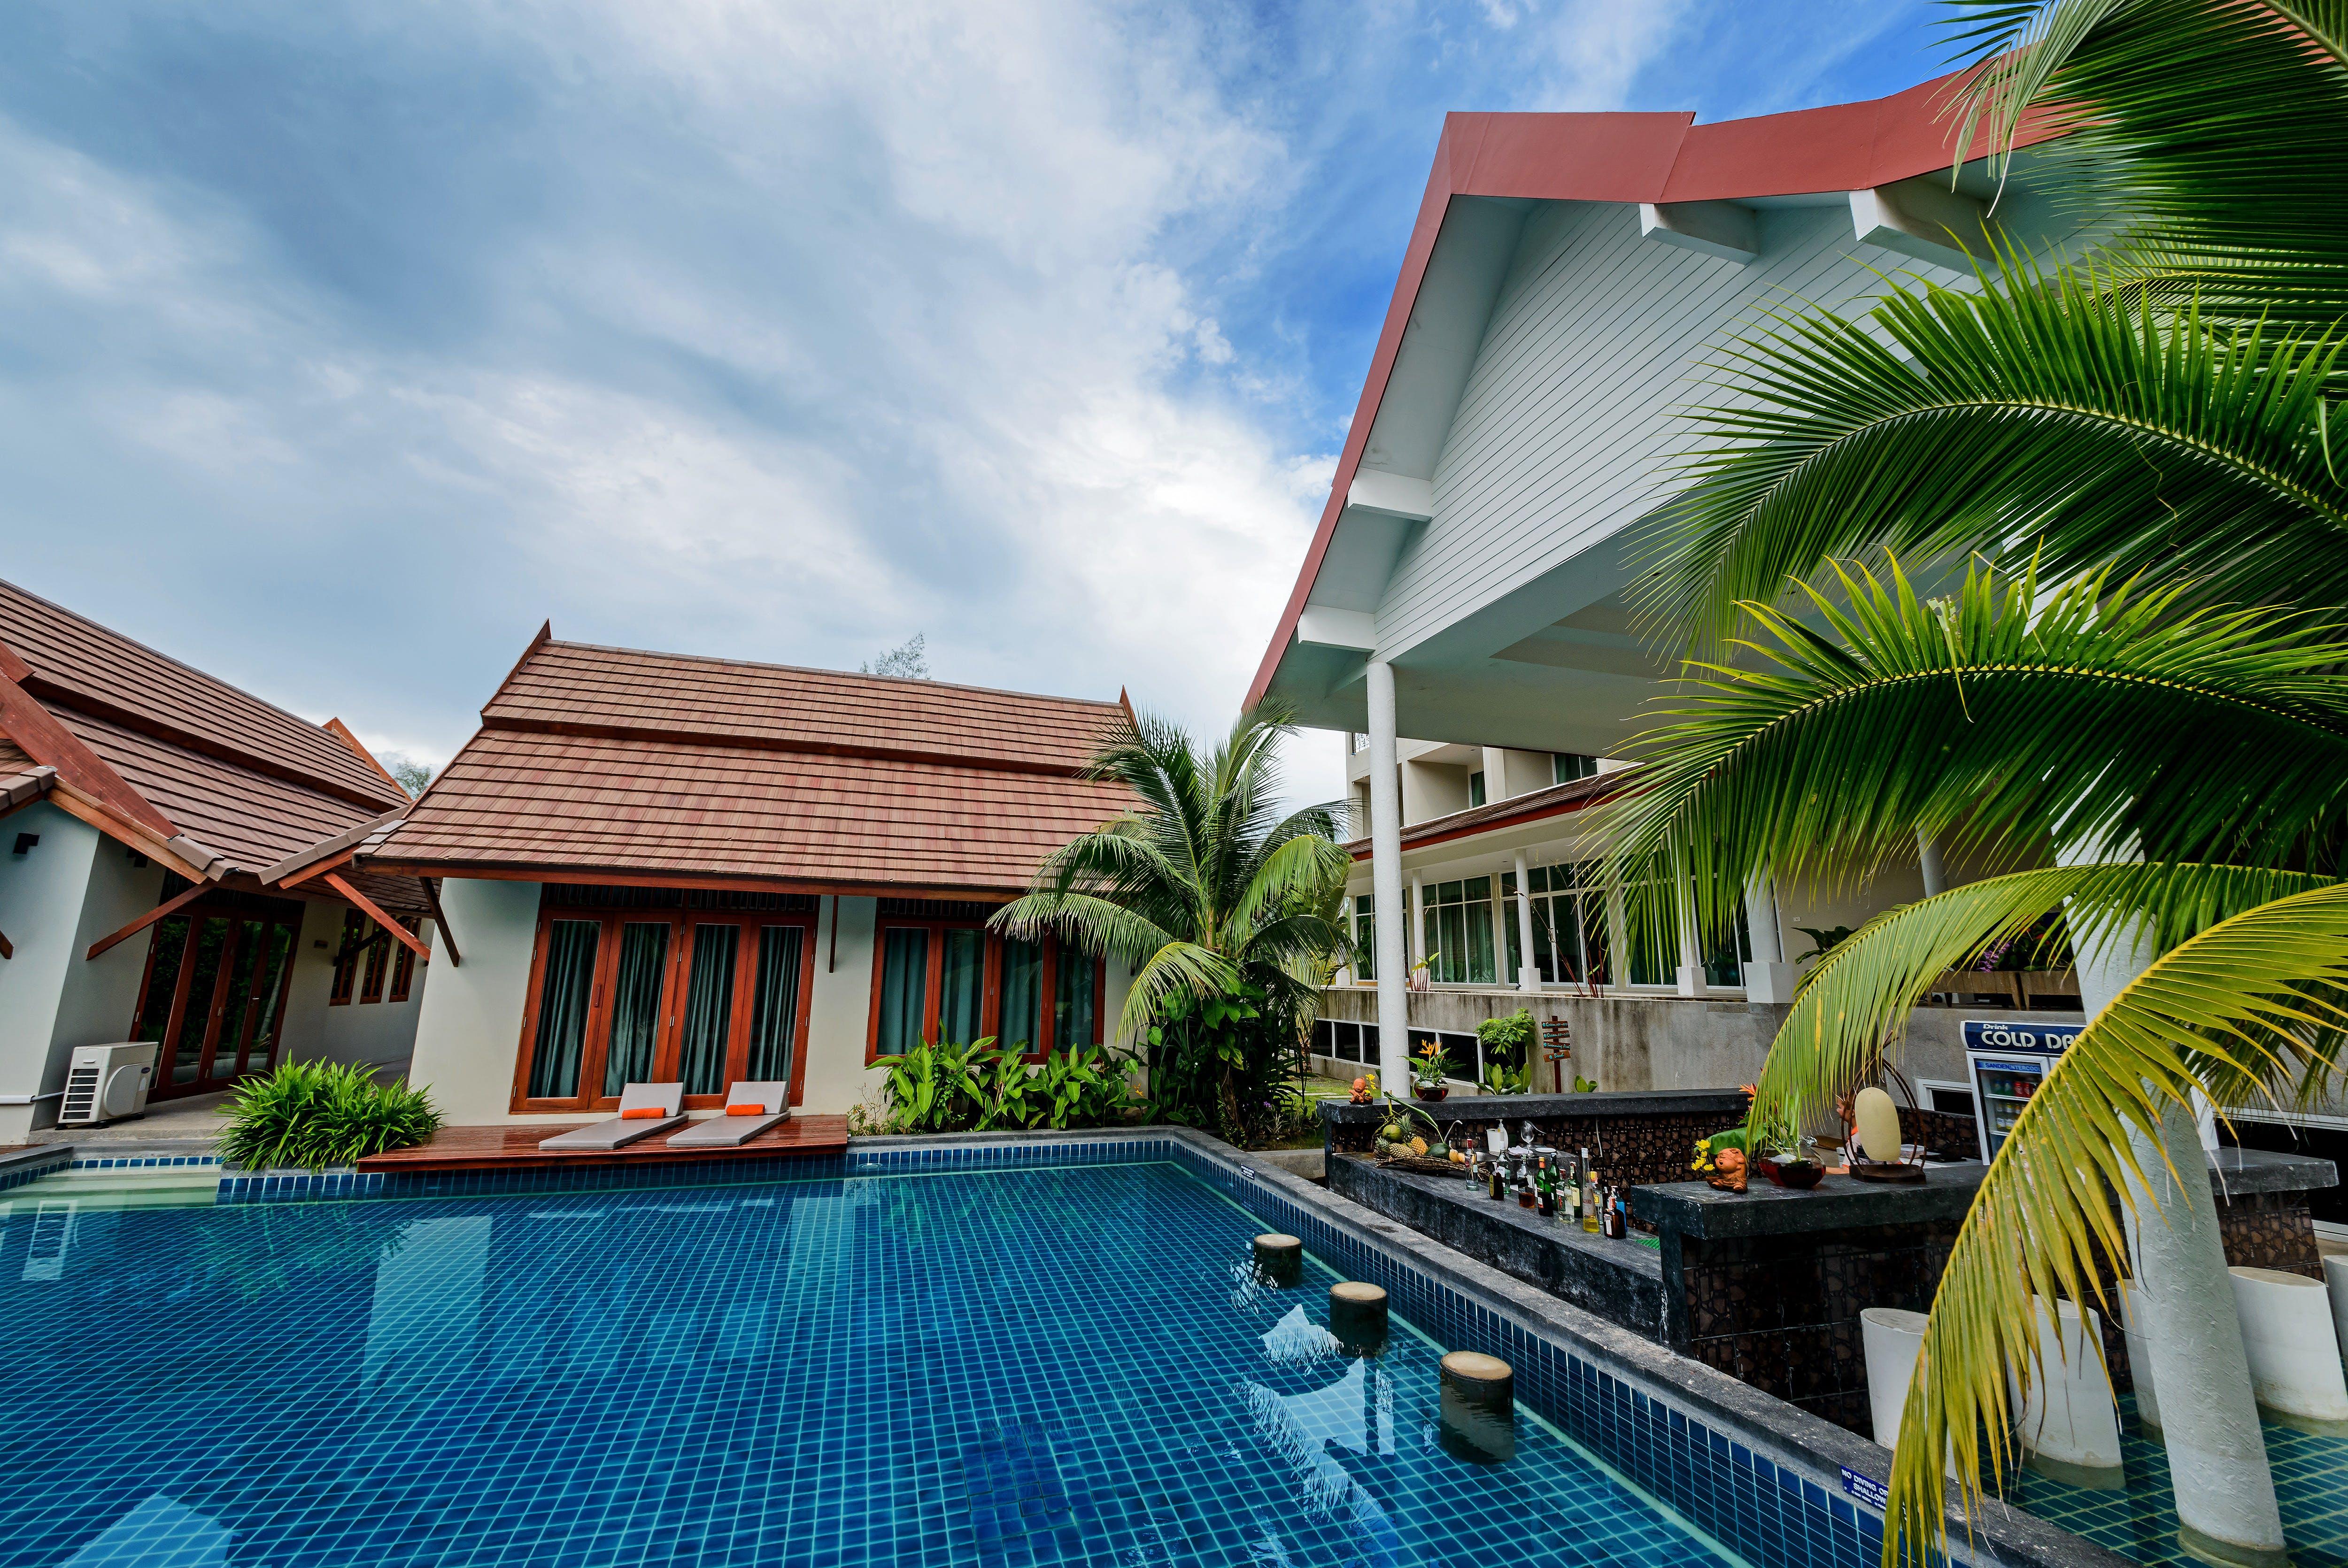 Swimming Pool Near Villas